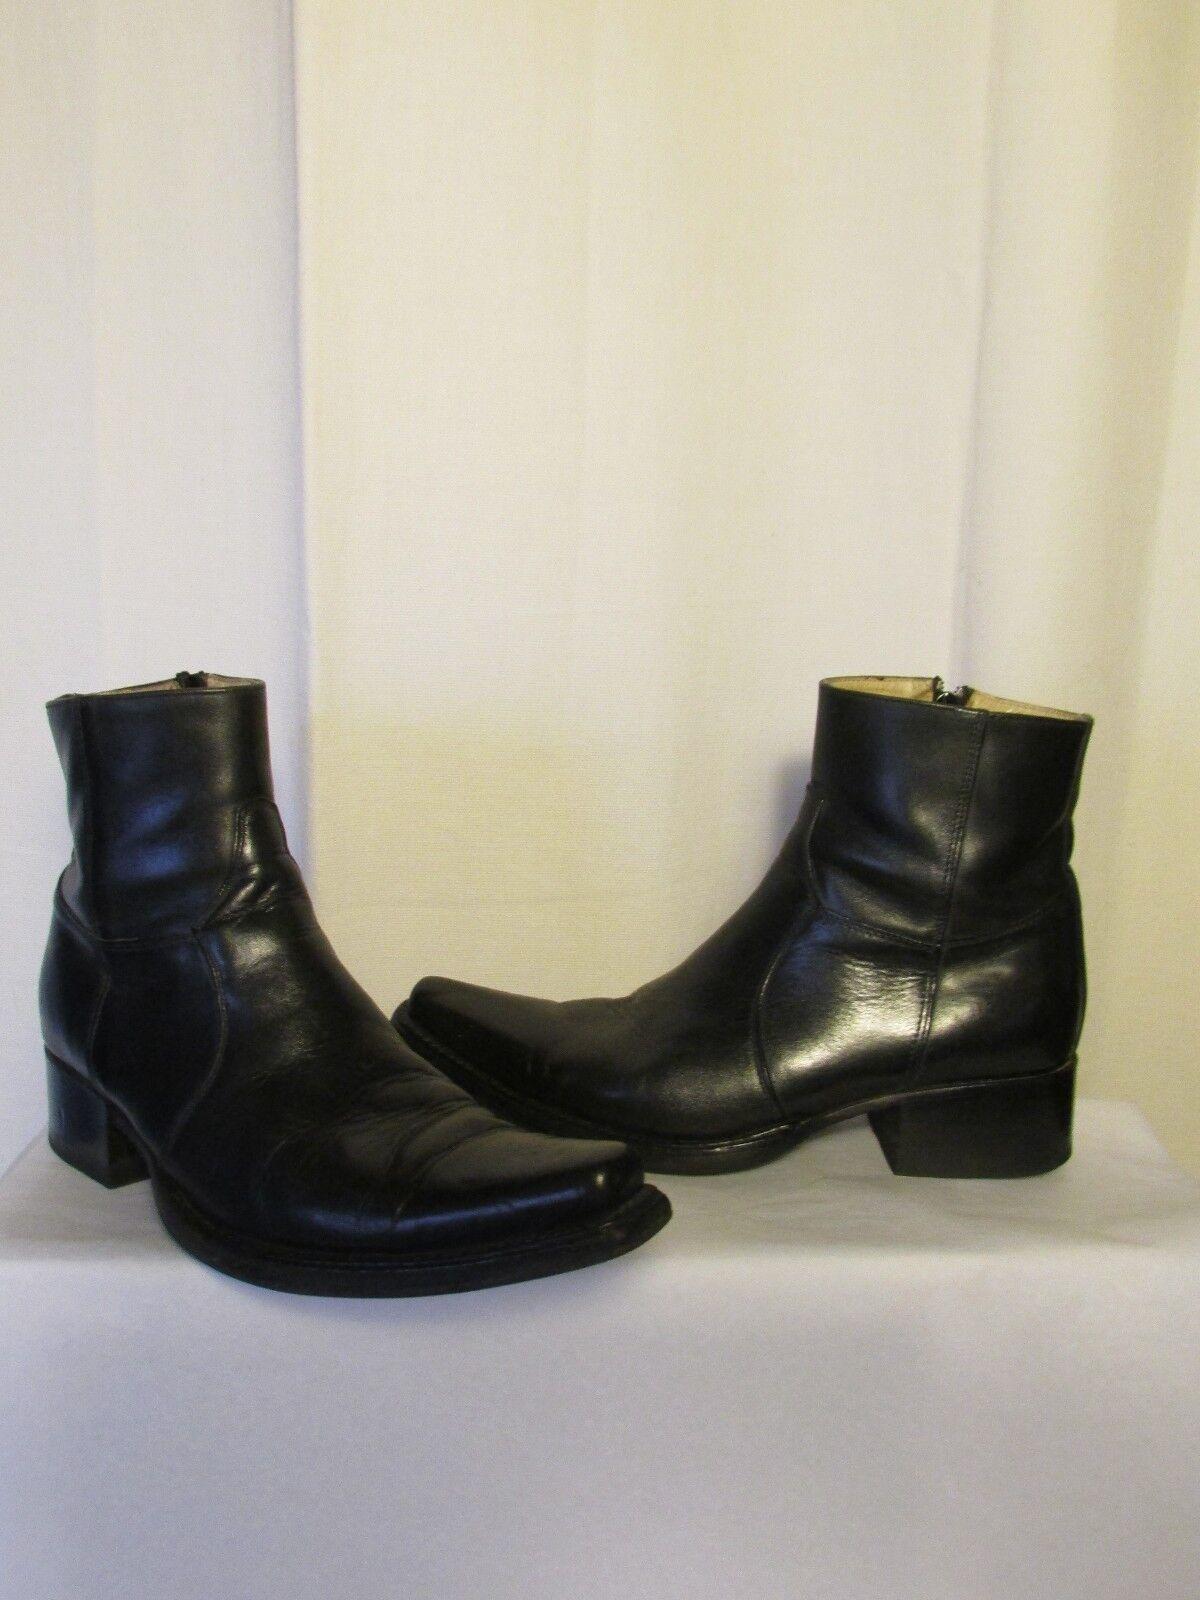 stivali/stivali SENDRA pelle nera nera nera 41 f9572f